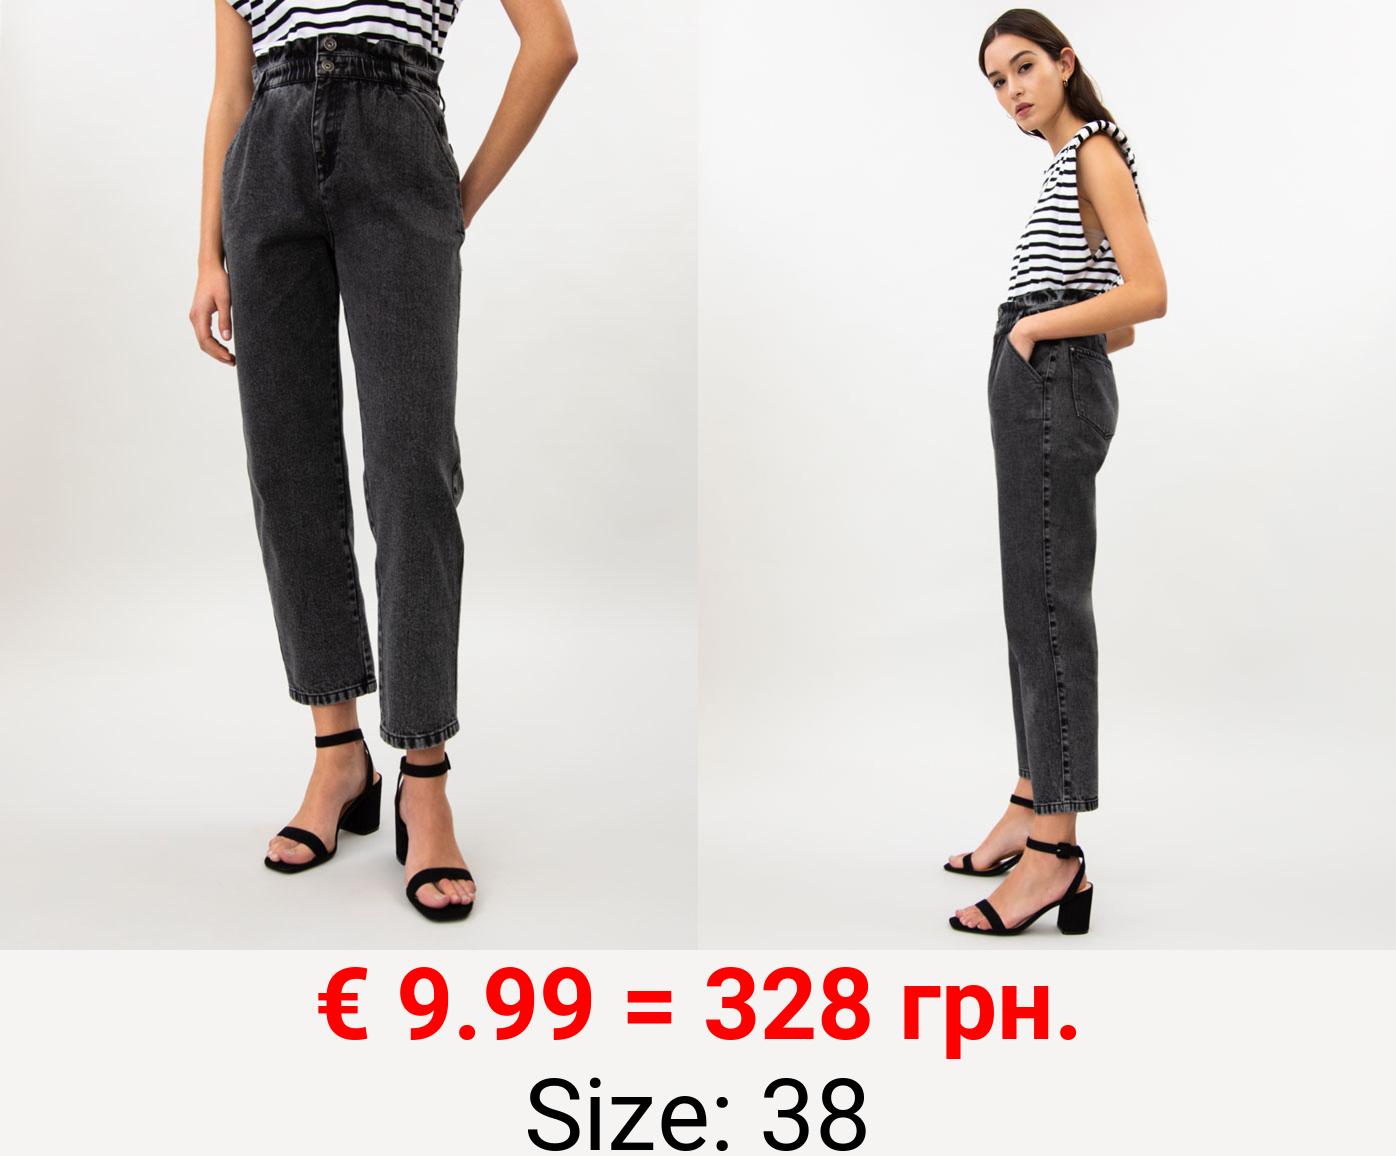 High-waist jeans with elastic